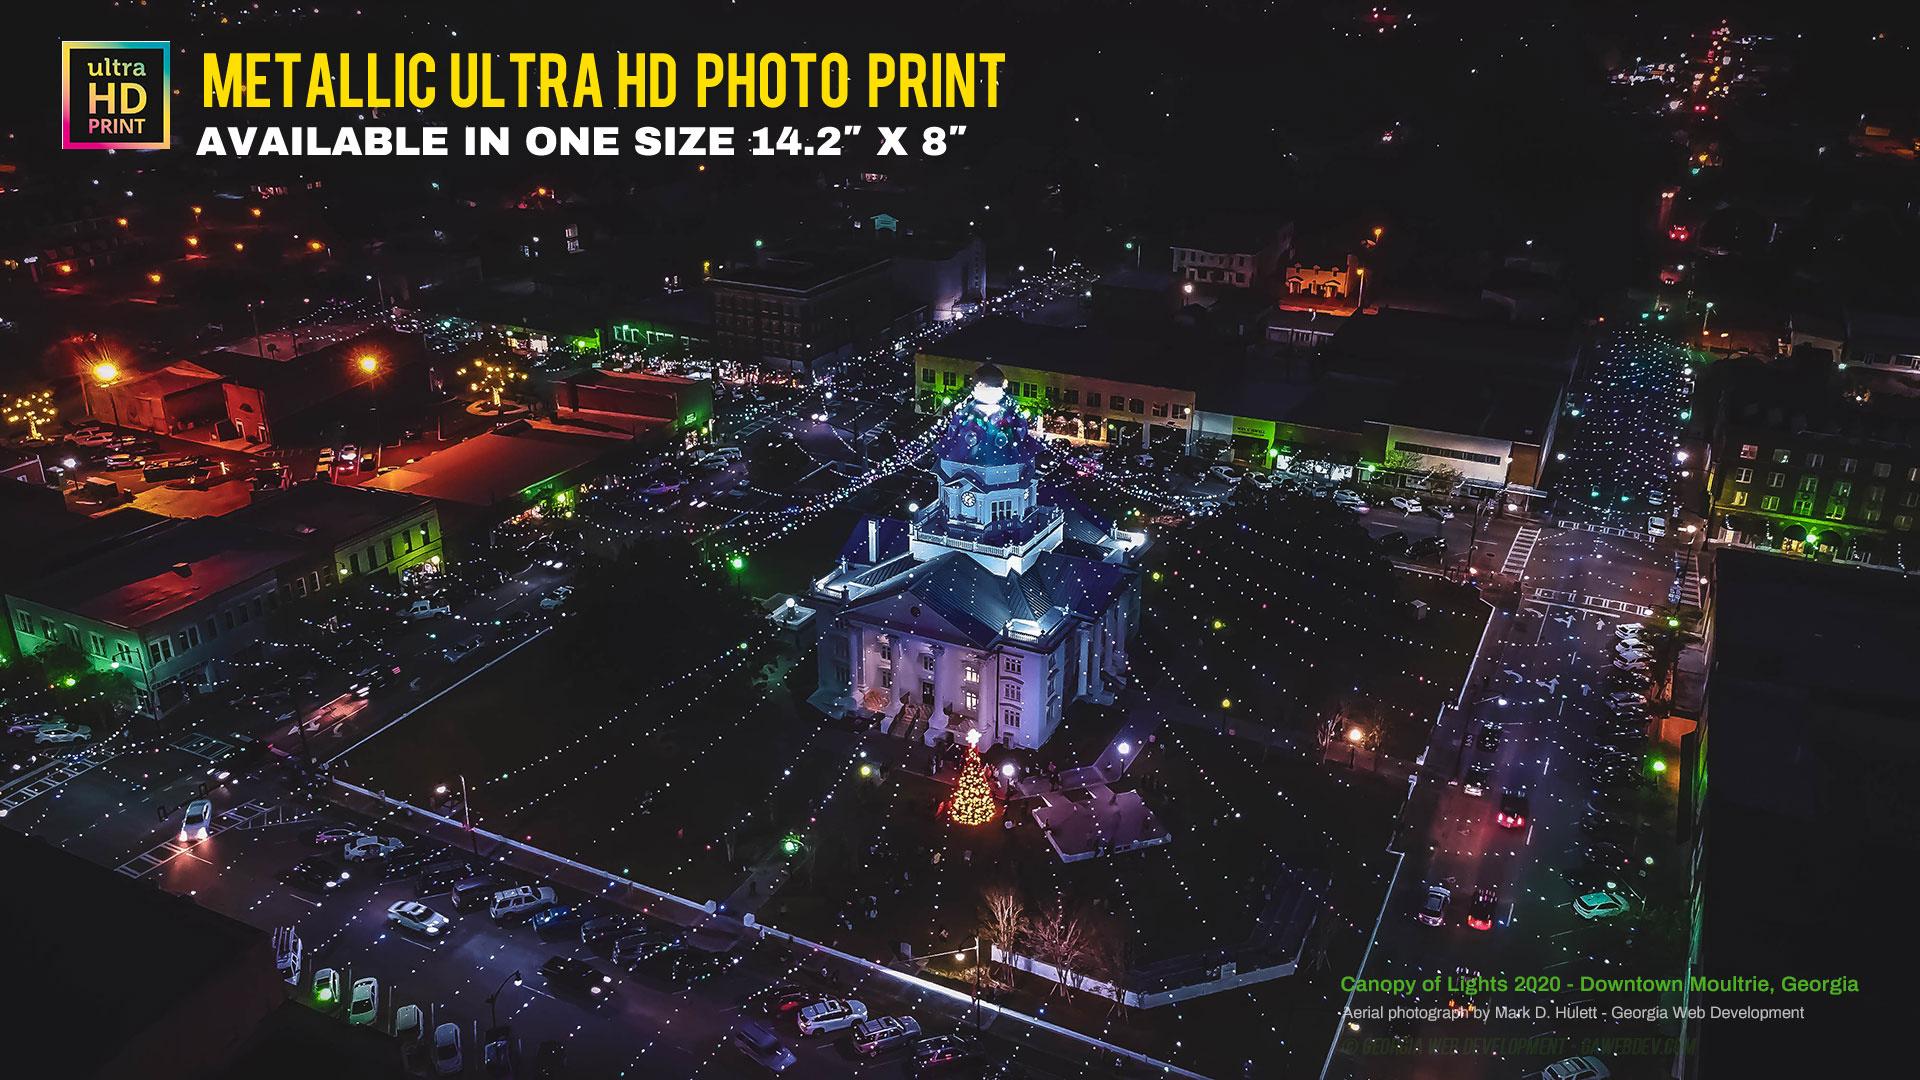 Downtown-Moultrie-Lights-2020-Print-4-Georgia-Web-Development-2020